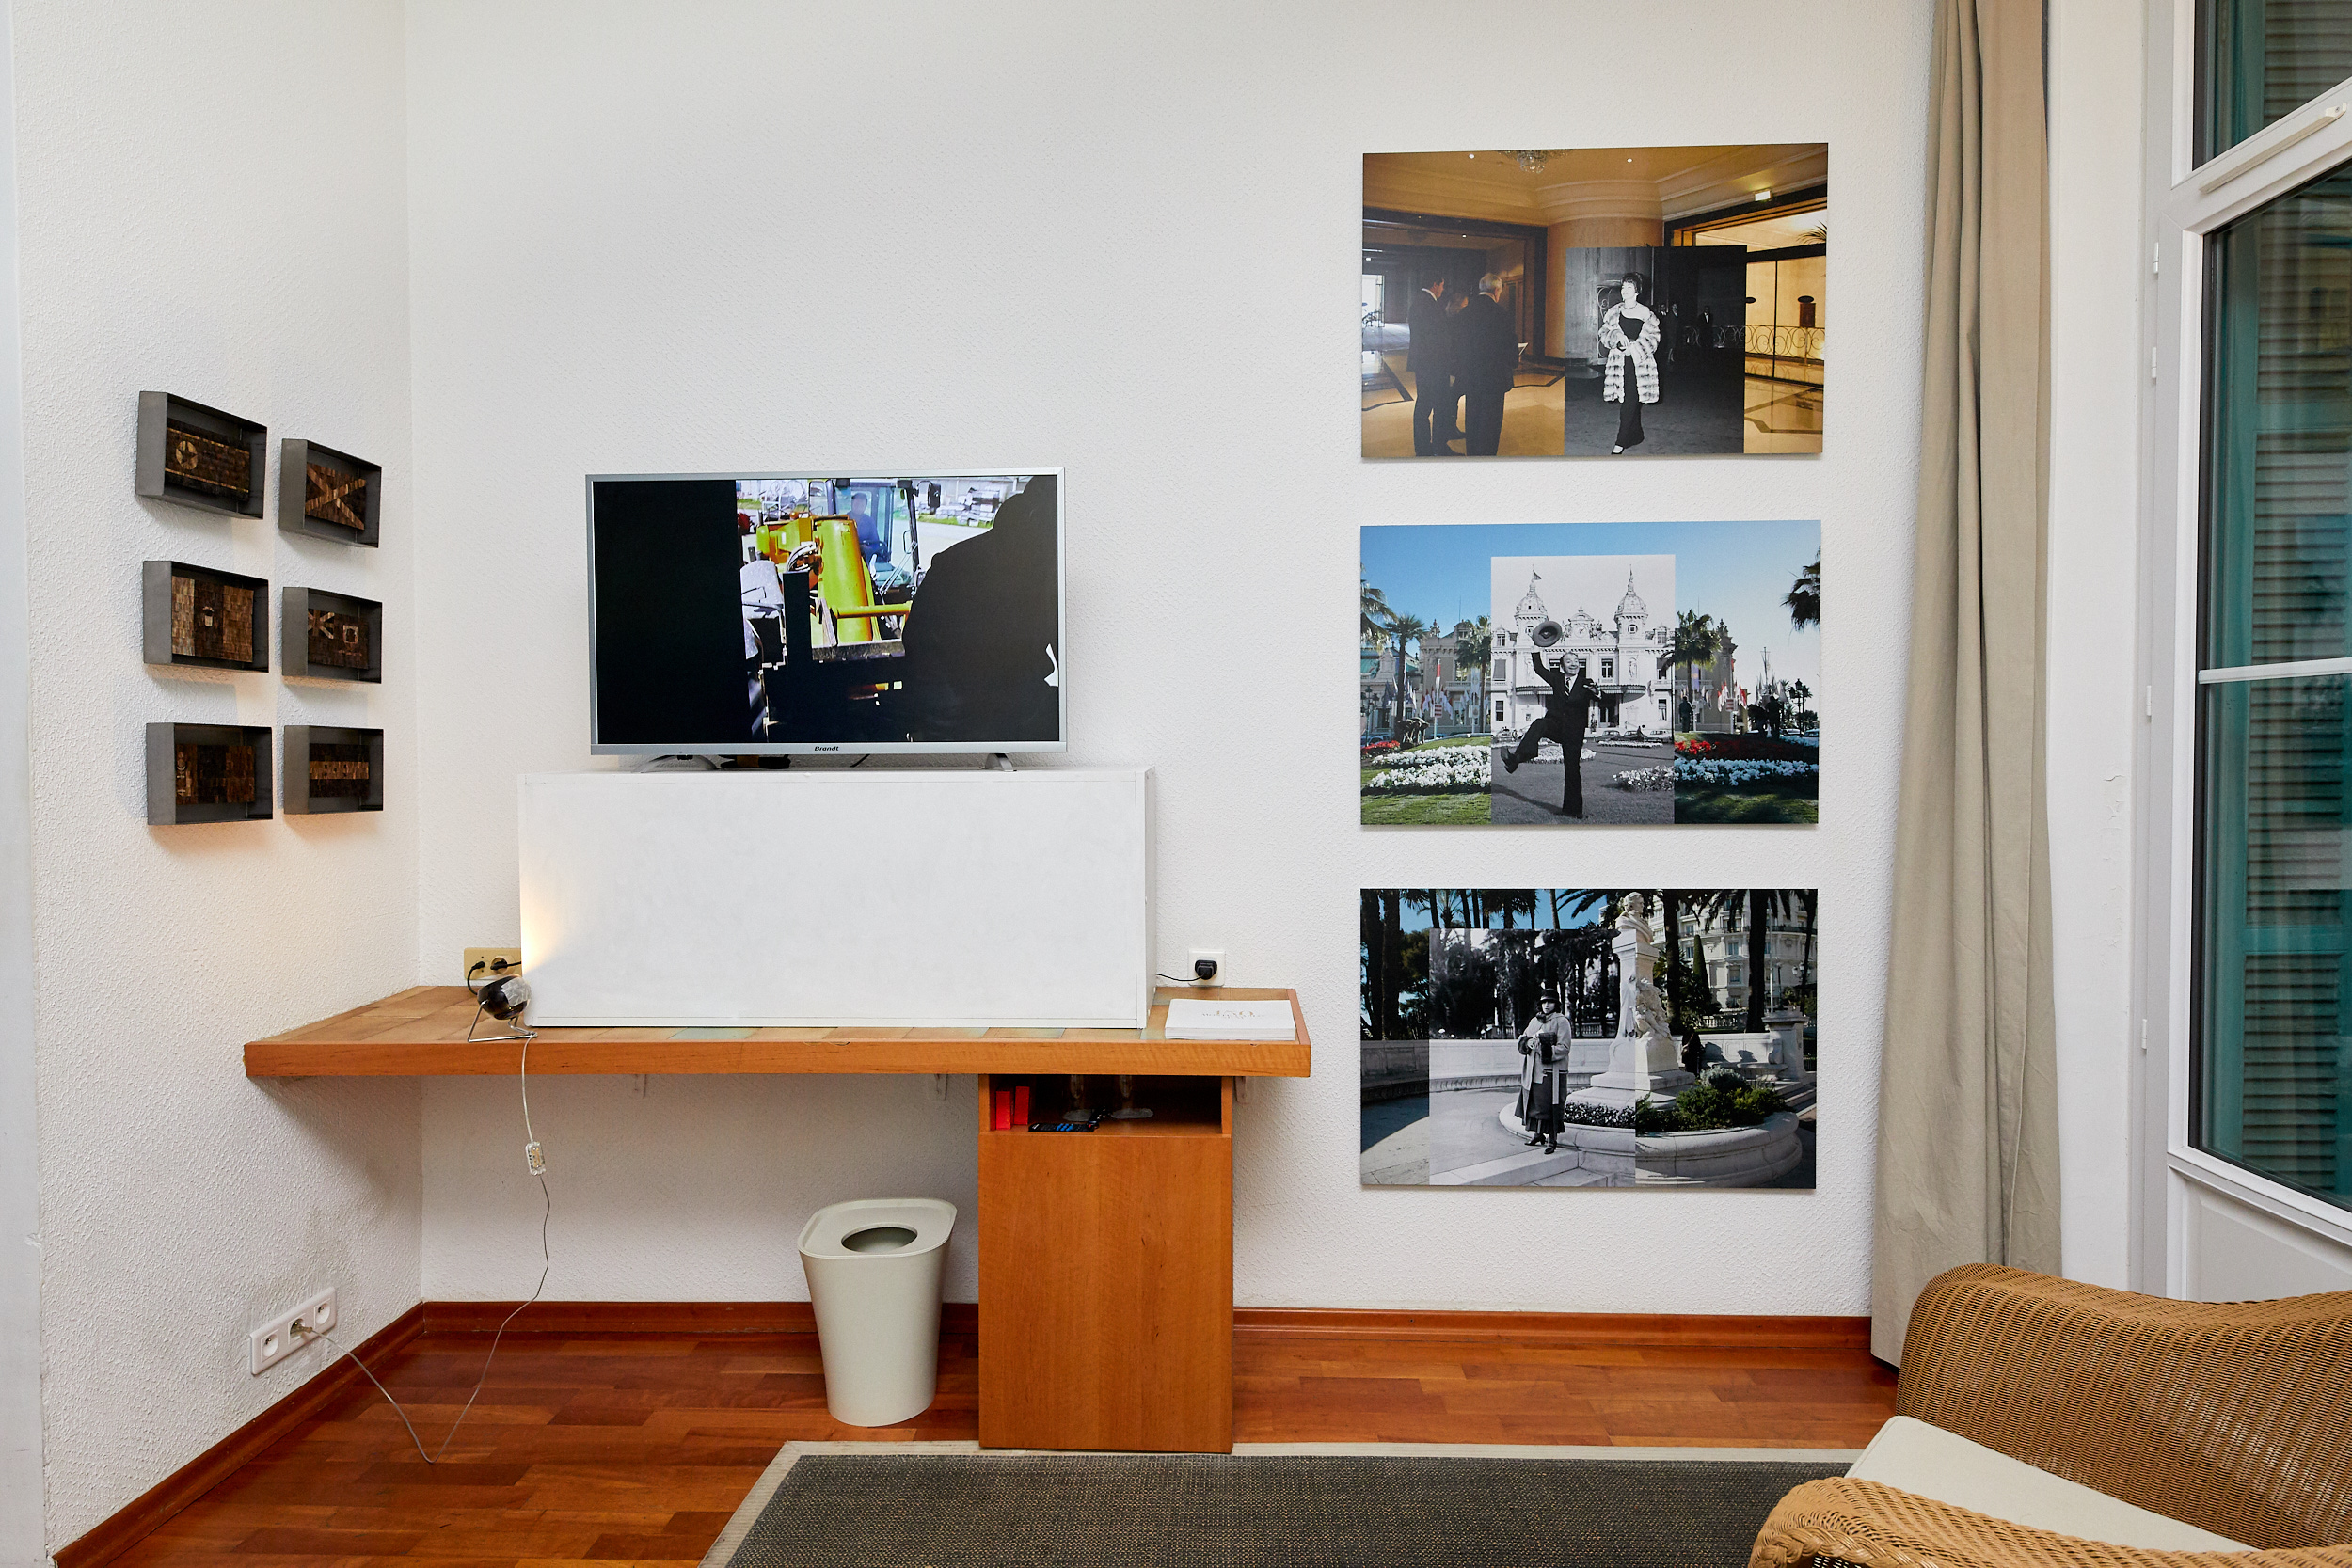 @ The Gallery Apart, Bertille Bak, 2019